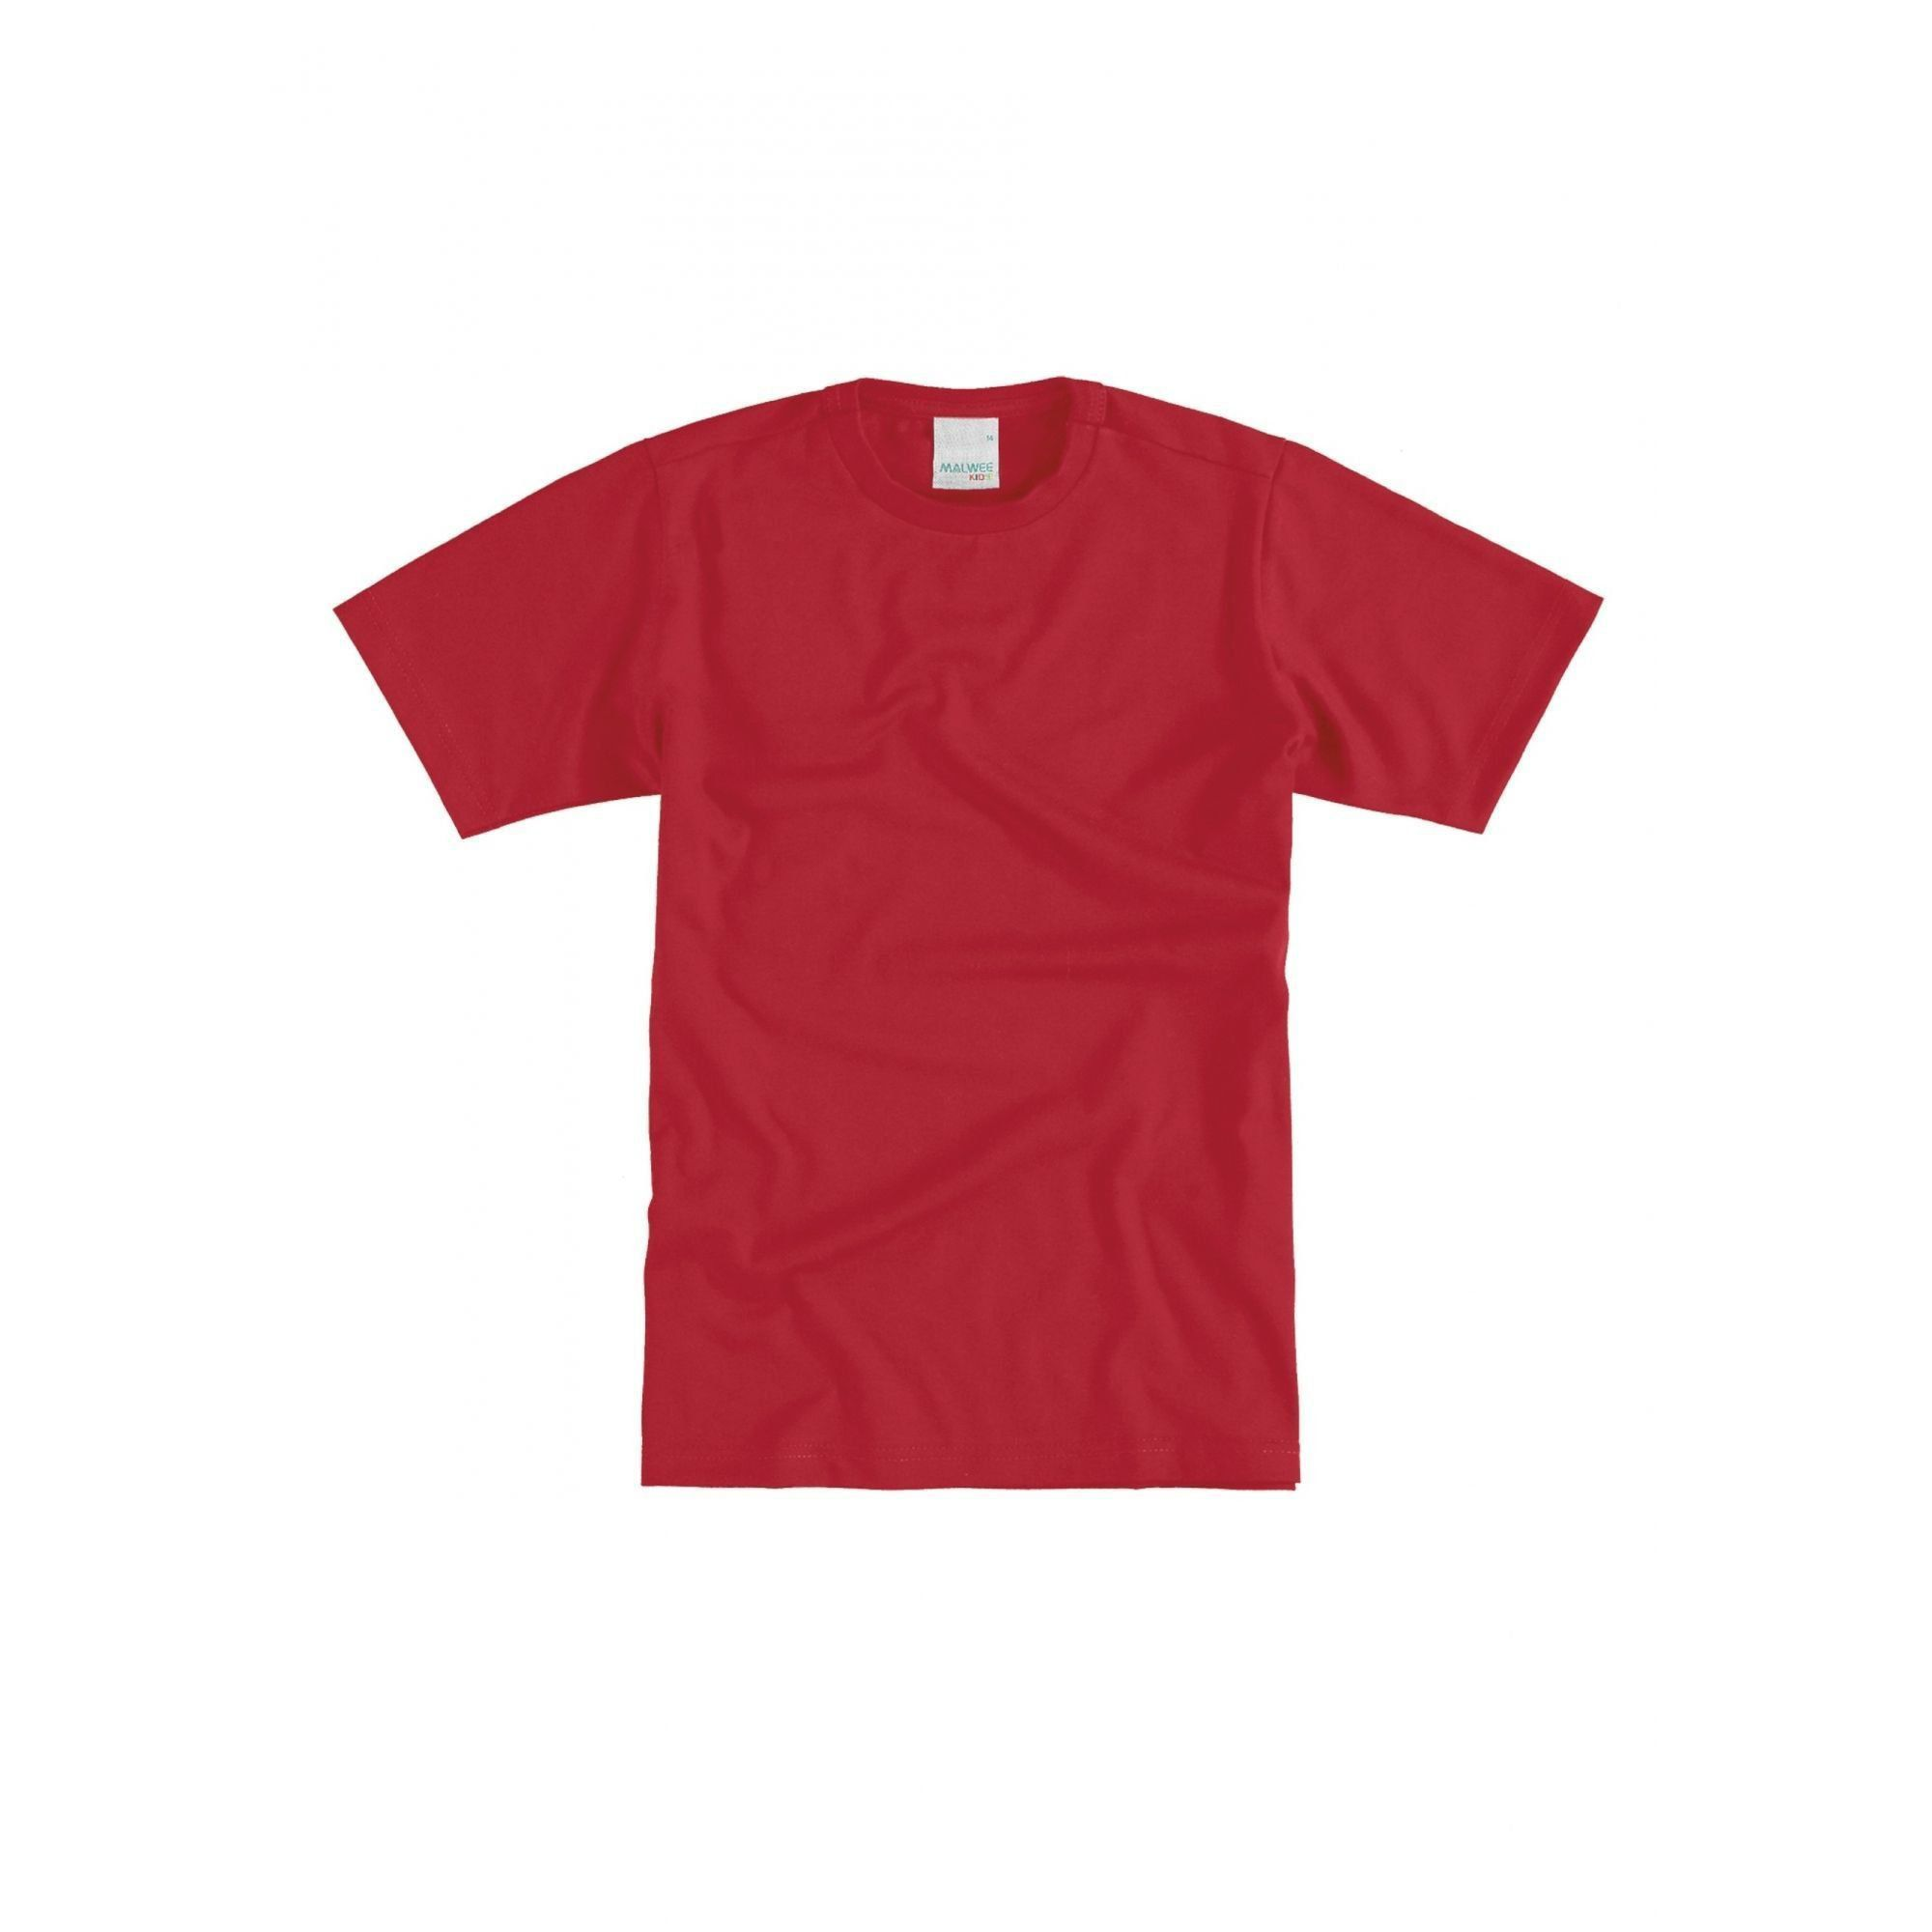 Camiseta Infantil Masculina Vermelha Malwee